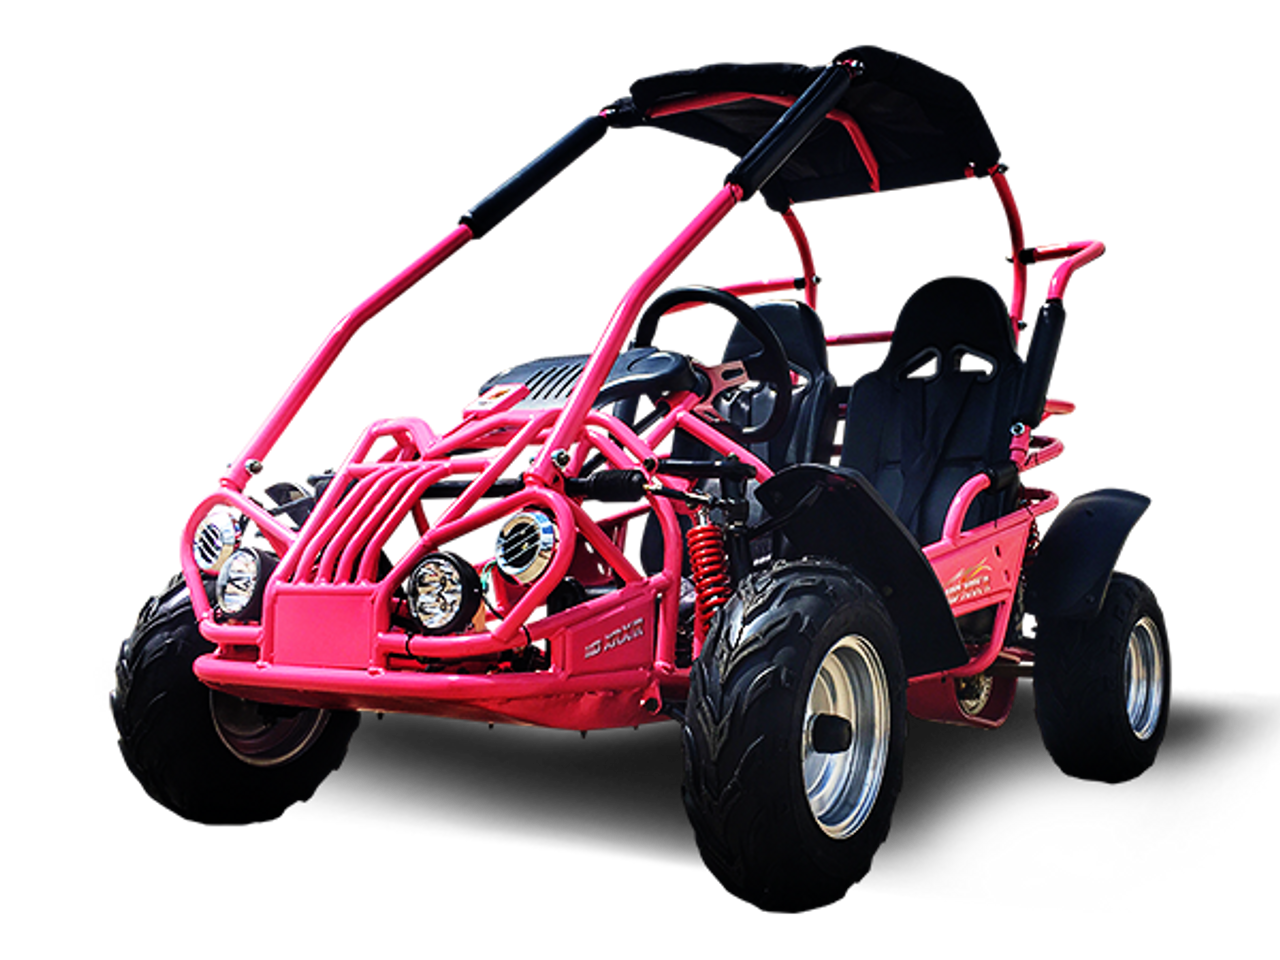 Trailmaster Mid XRX-R (Go Kart with Reverse) | Mid XRX-R